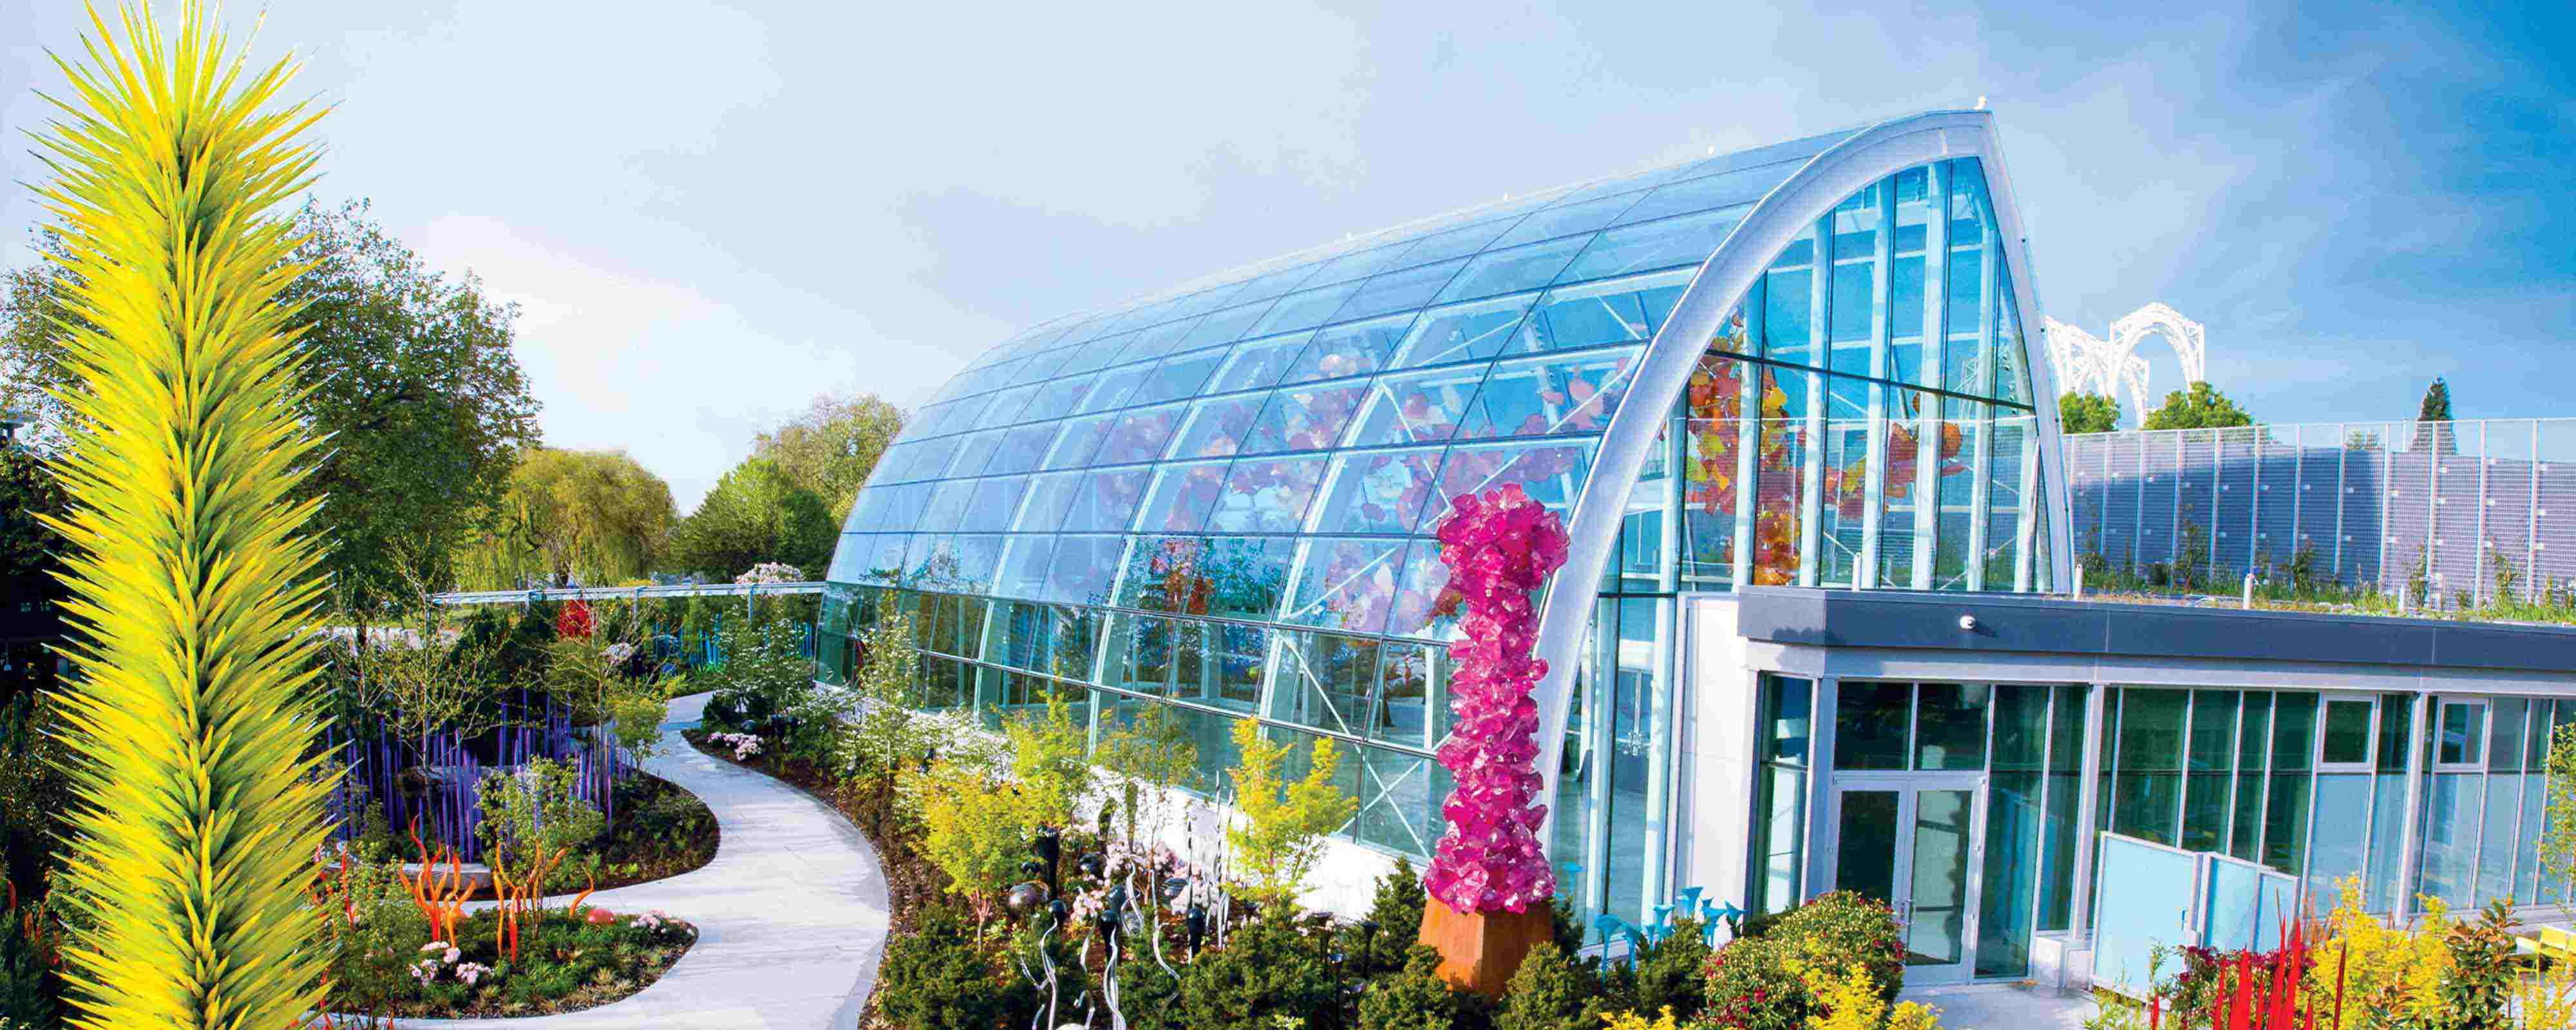 Chihuly Garden And Glass Chihuly Garden And Glass Blog